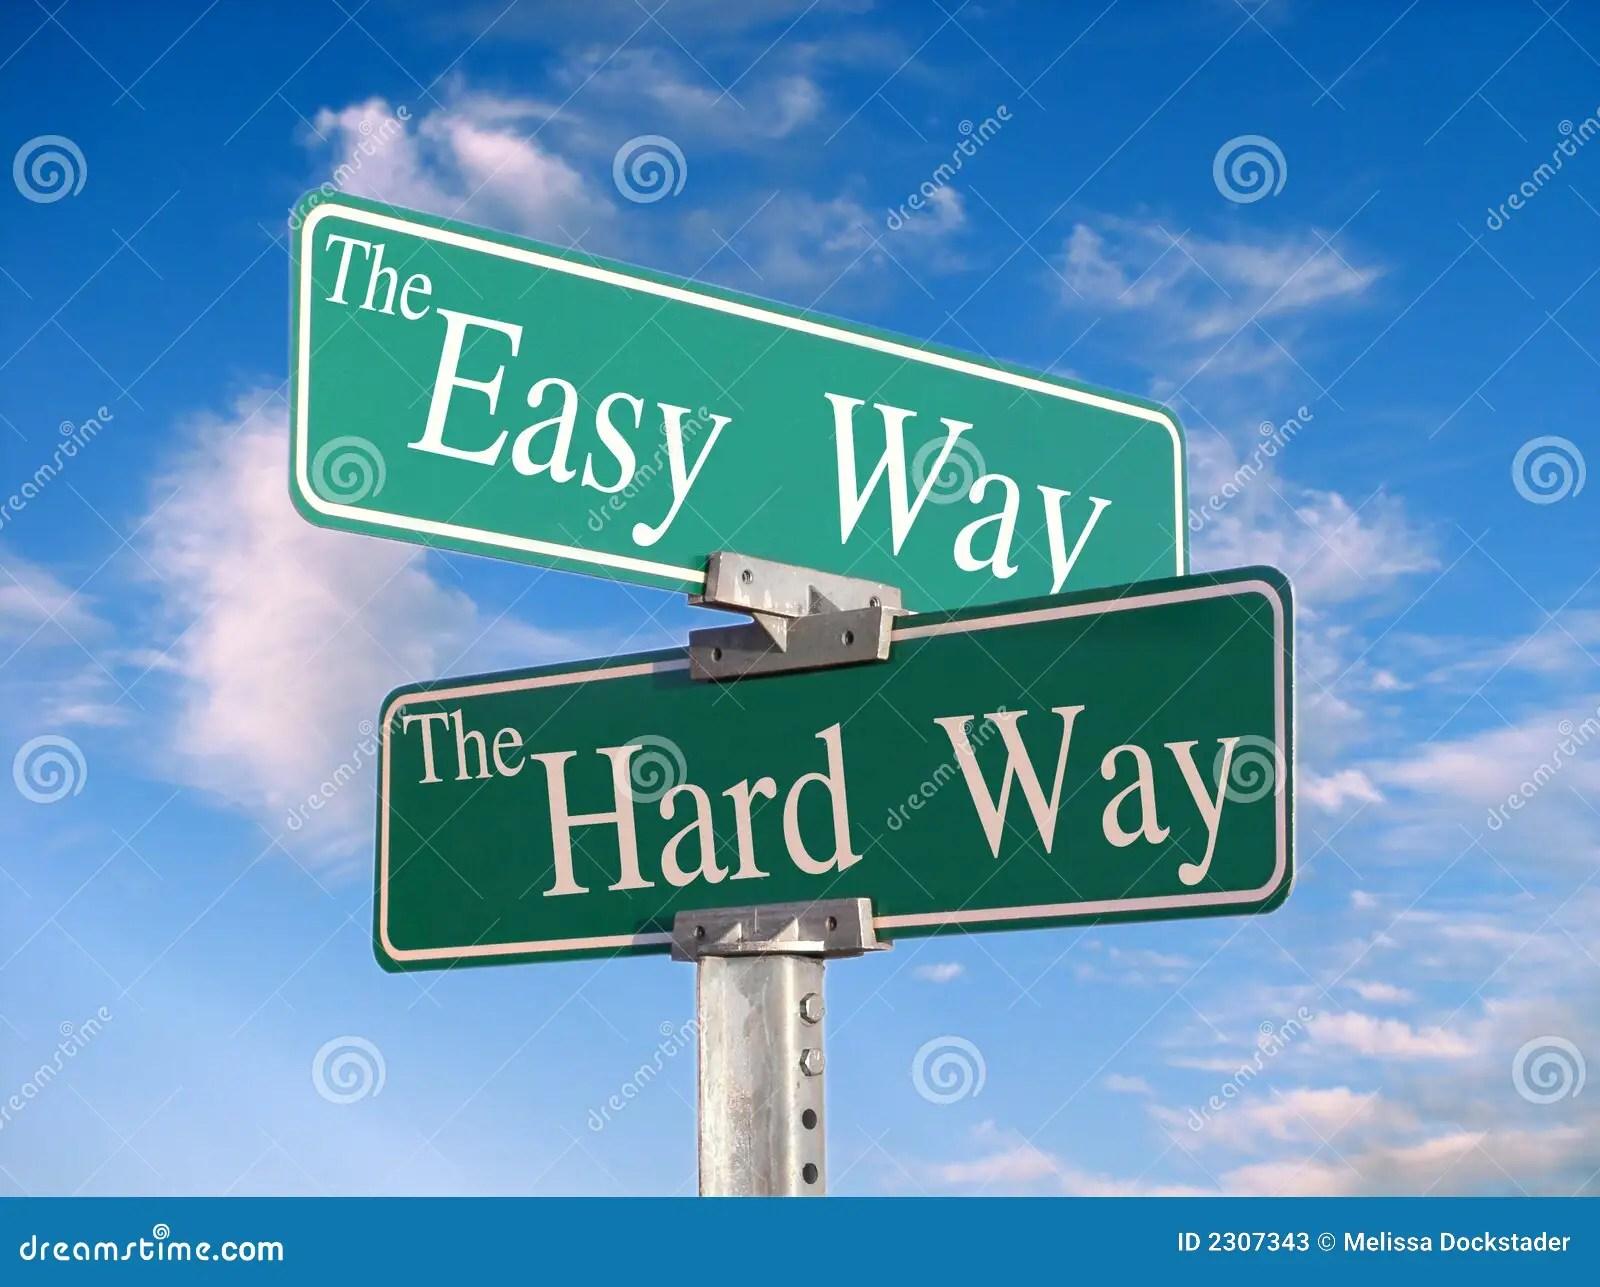 The Easy Way Or Hard Way Stock Photos  Image 2307343